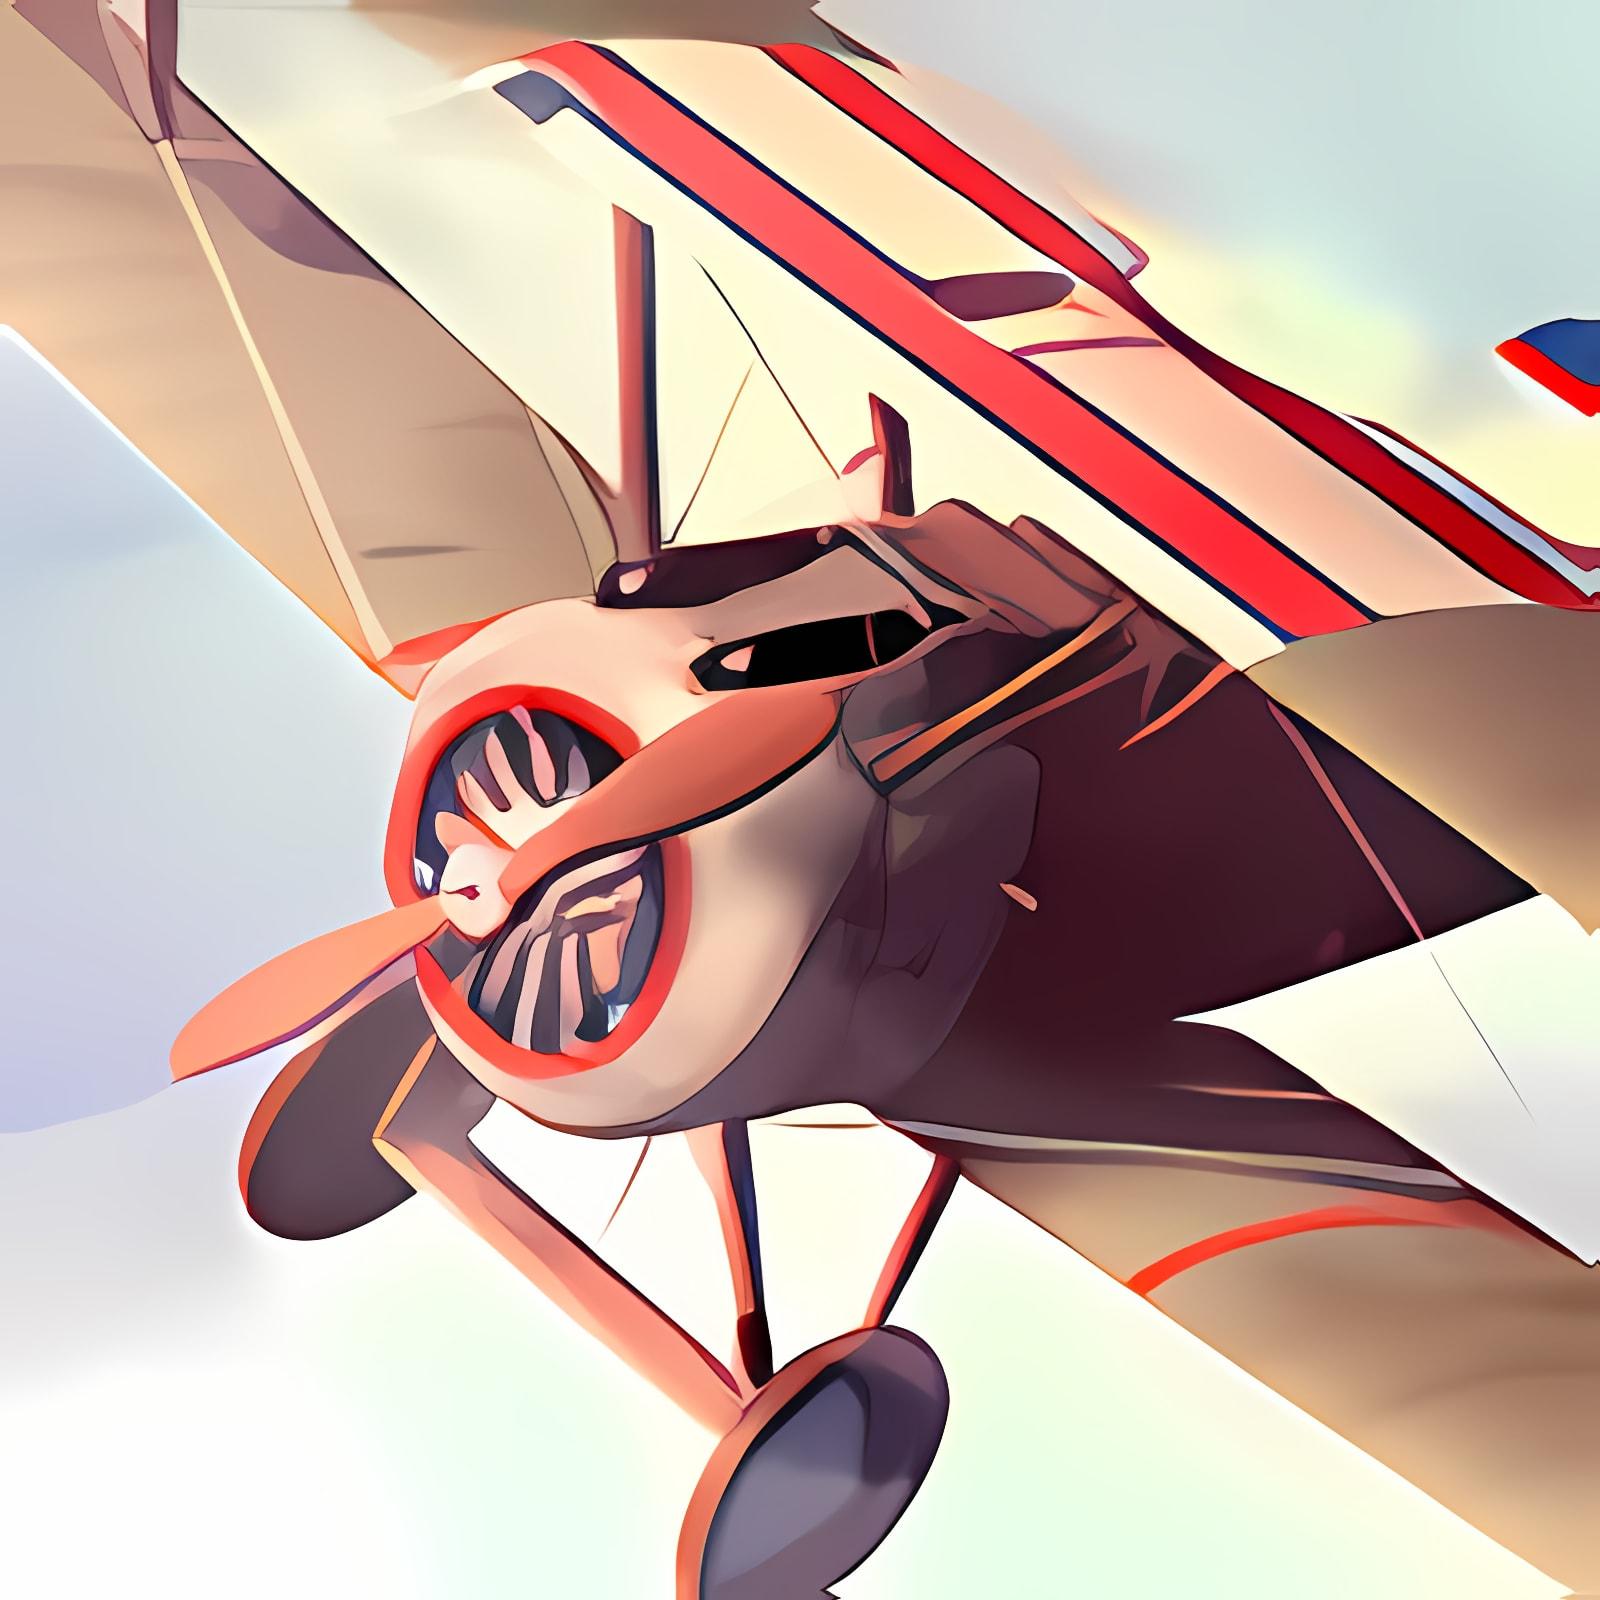 Flight Theory para Windows 10 1.1.0.24